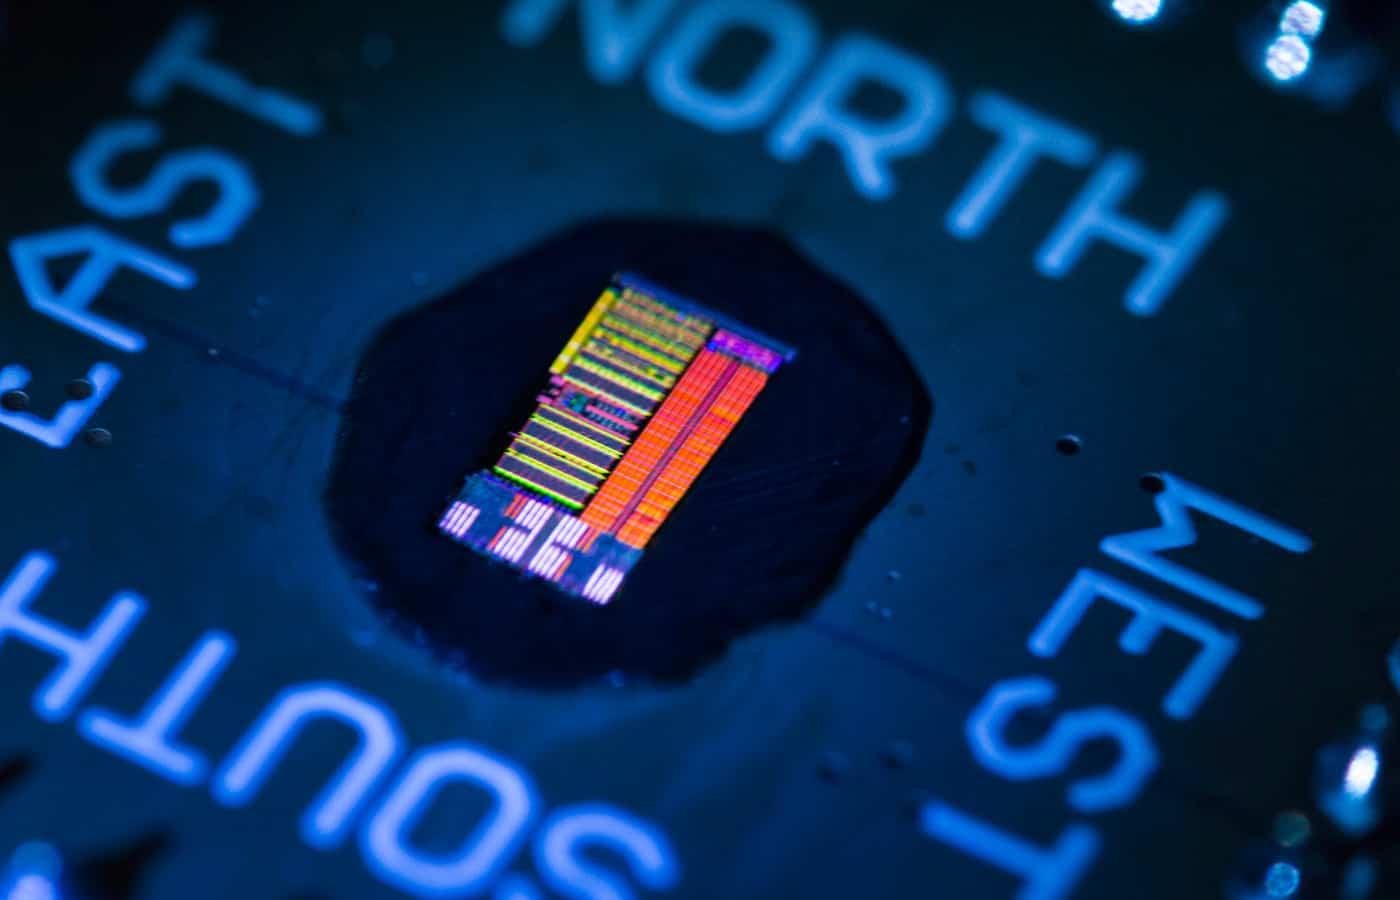 photonic-processor-university-of-colorado